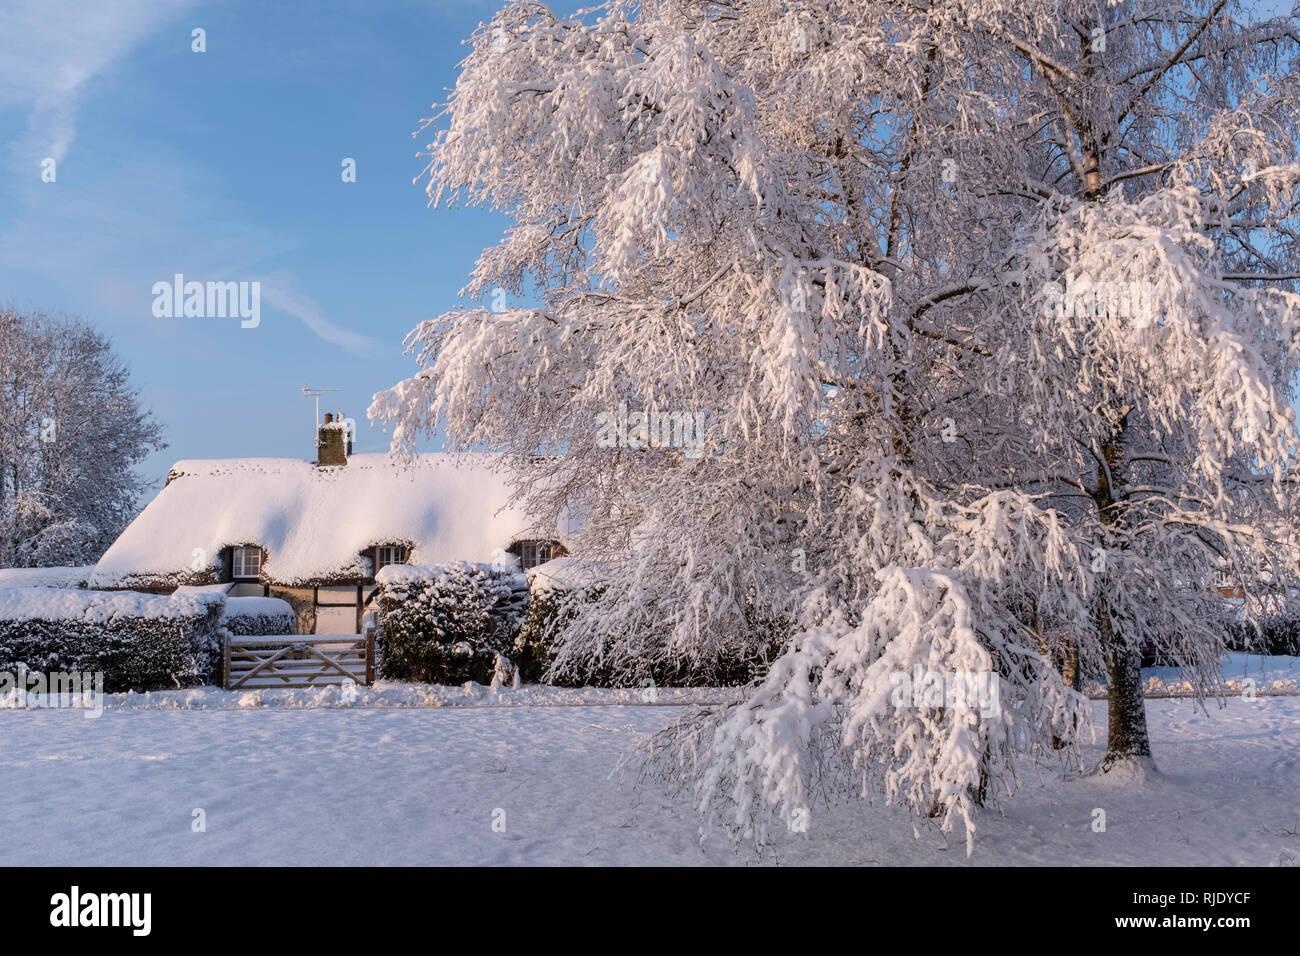 Snowy village, Upper Wield, Hampshire, UK - Stock Image